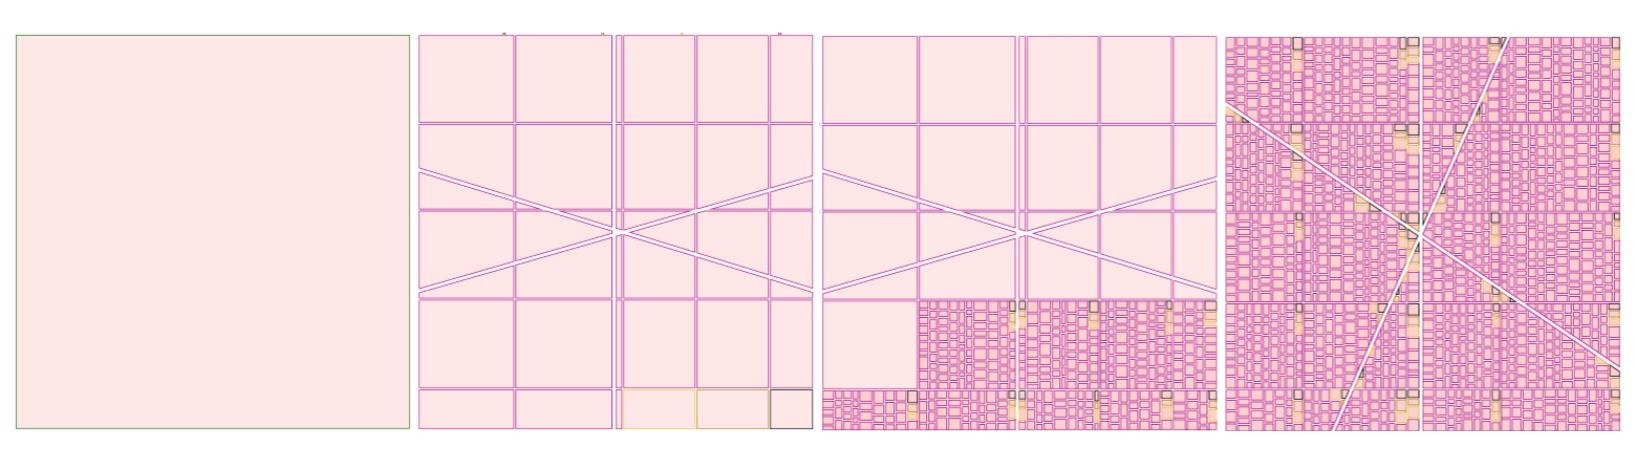 City's layout generation